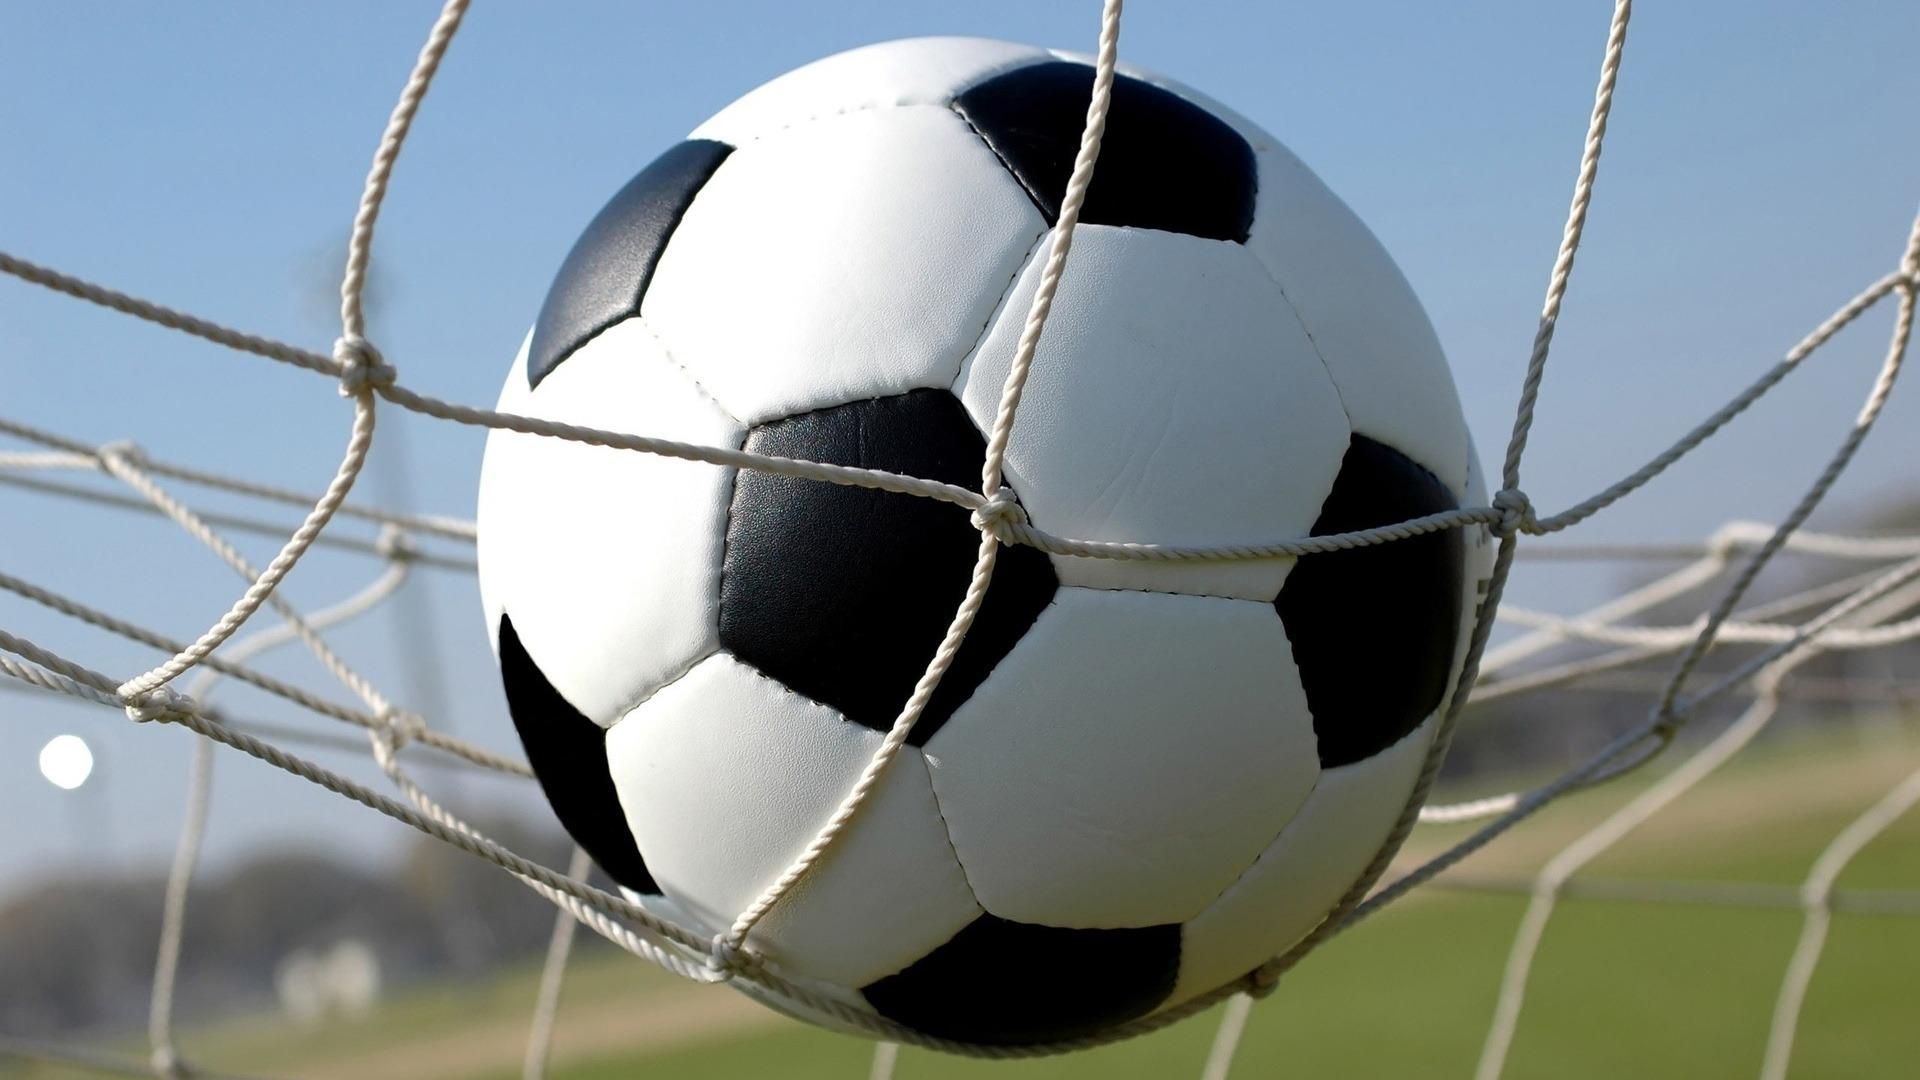 Goal-1080p-HD-Sports-wallpaper-wp3406263